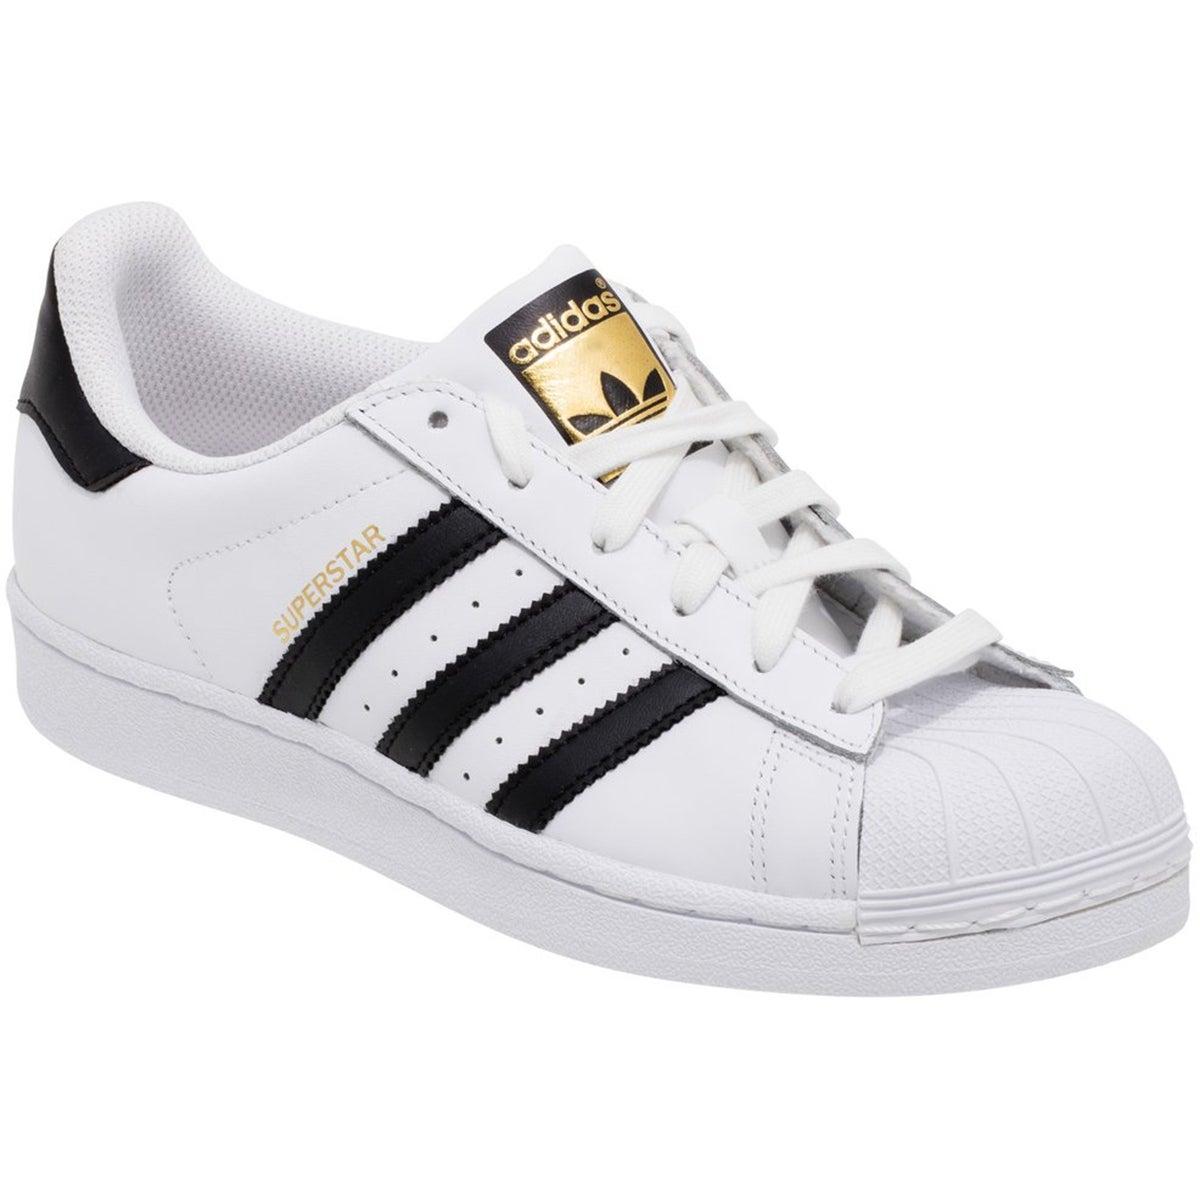 mens black and white shell toe adidas